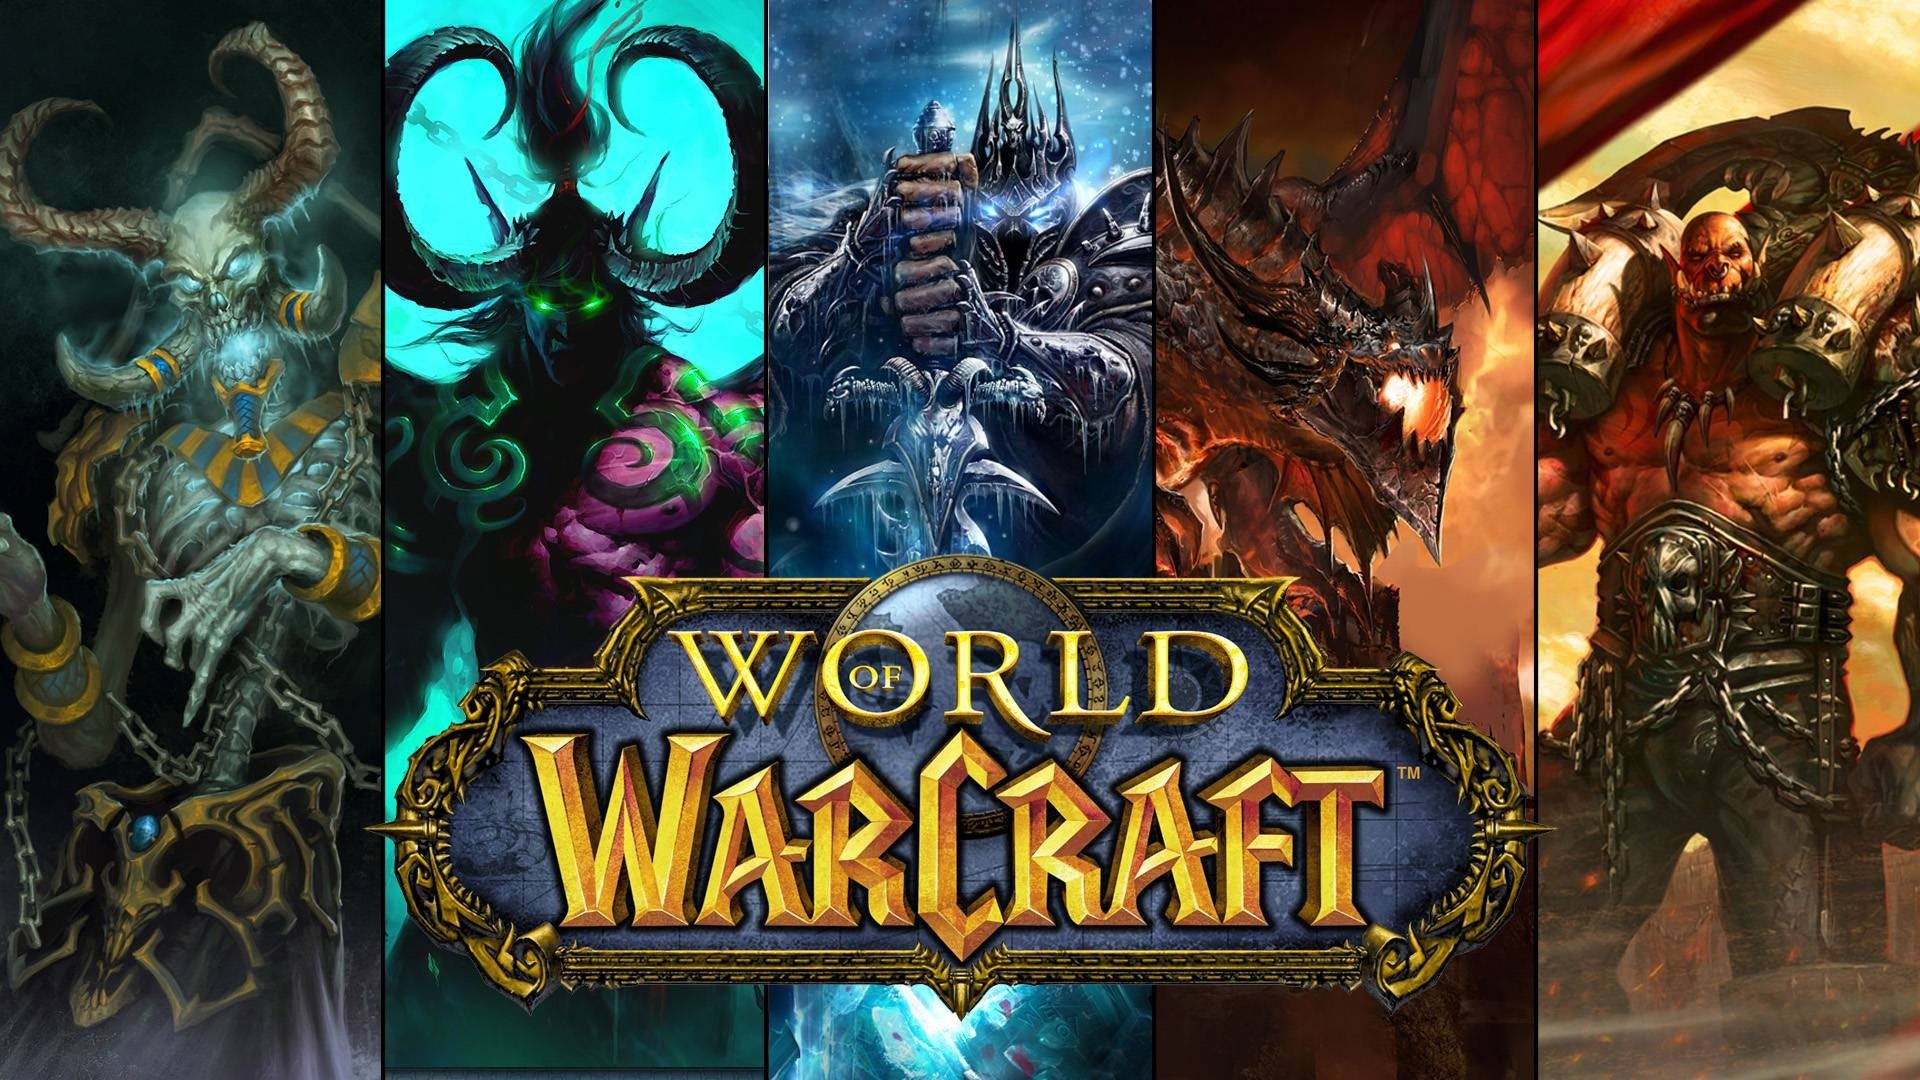 World of Warcraft Expansion